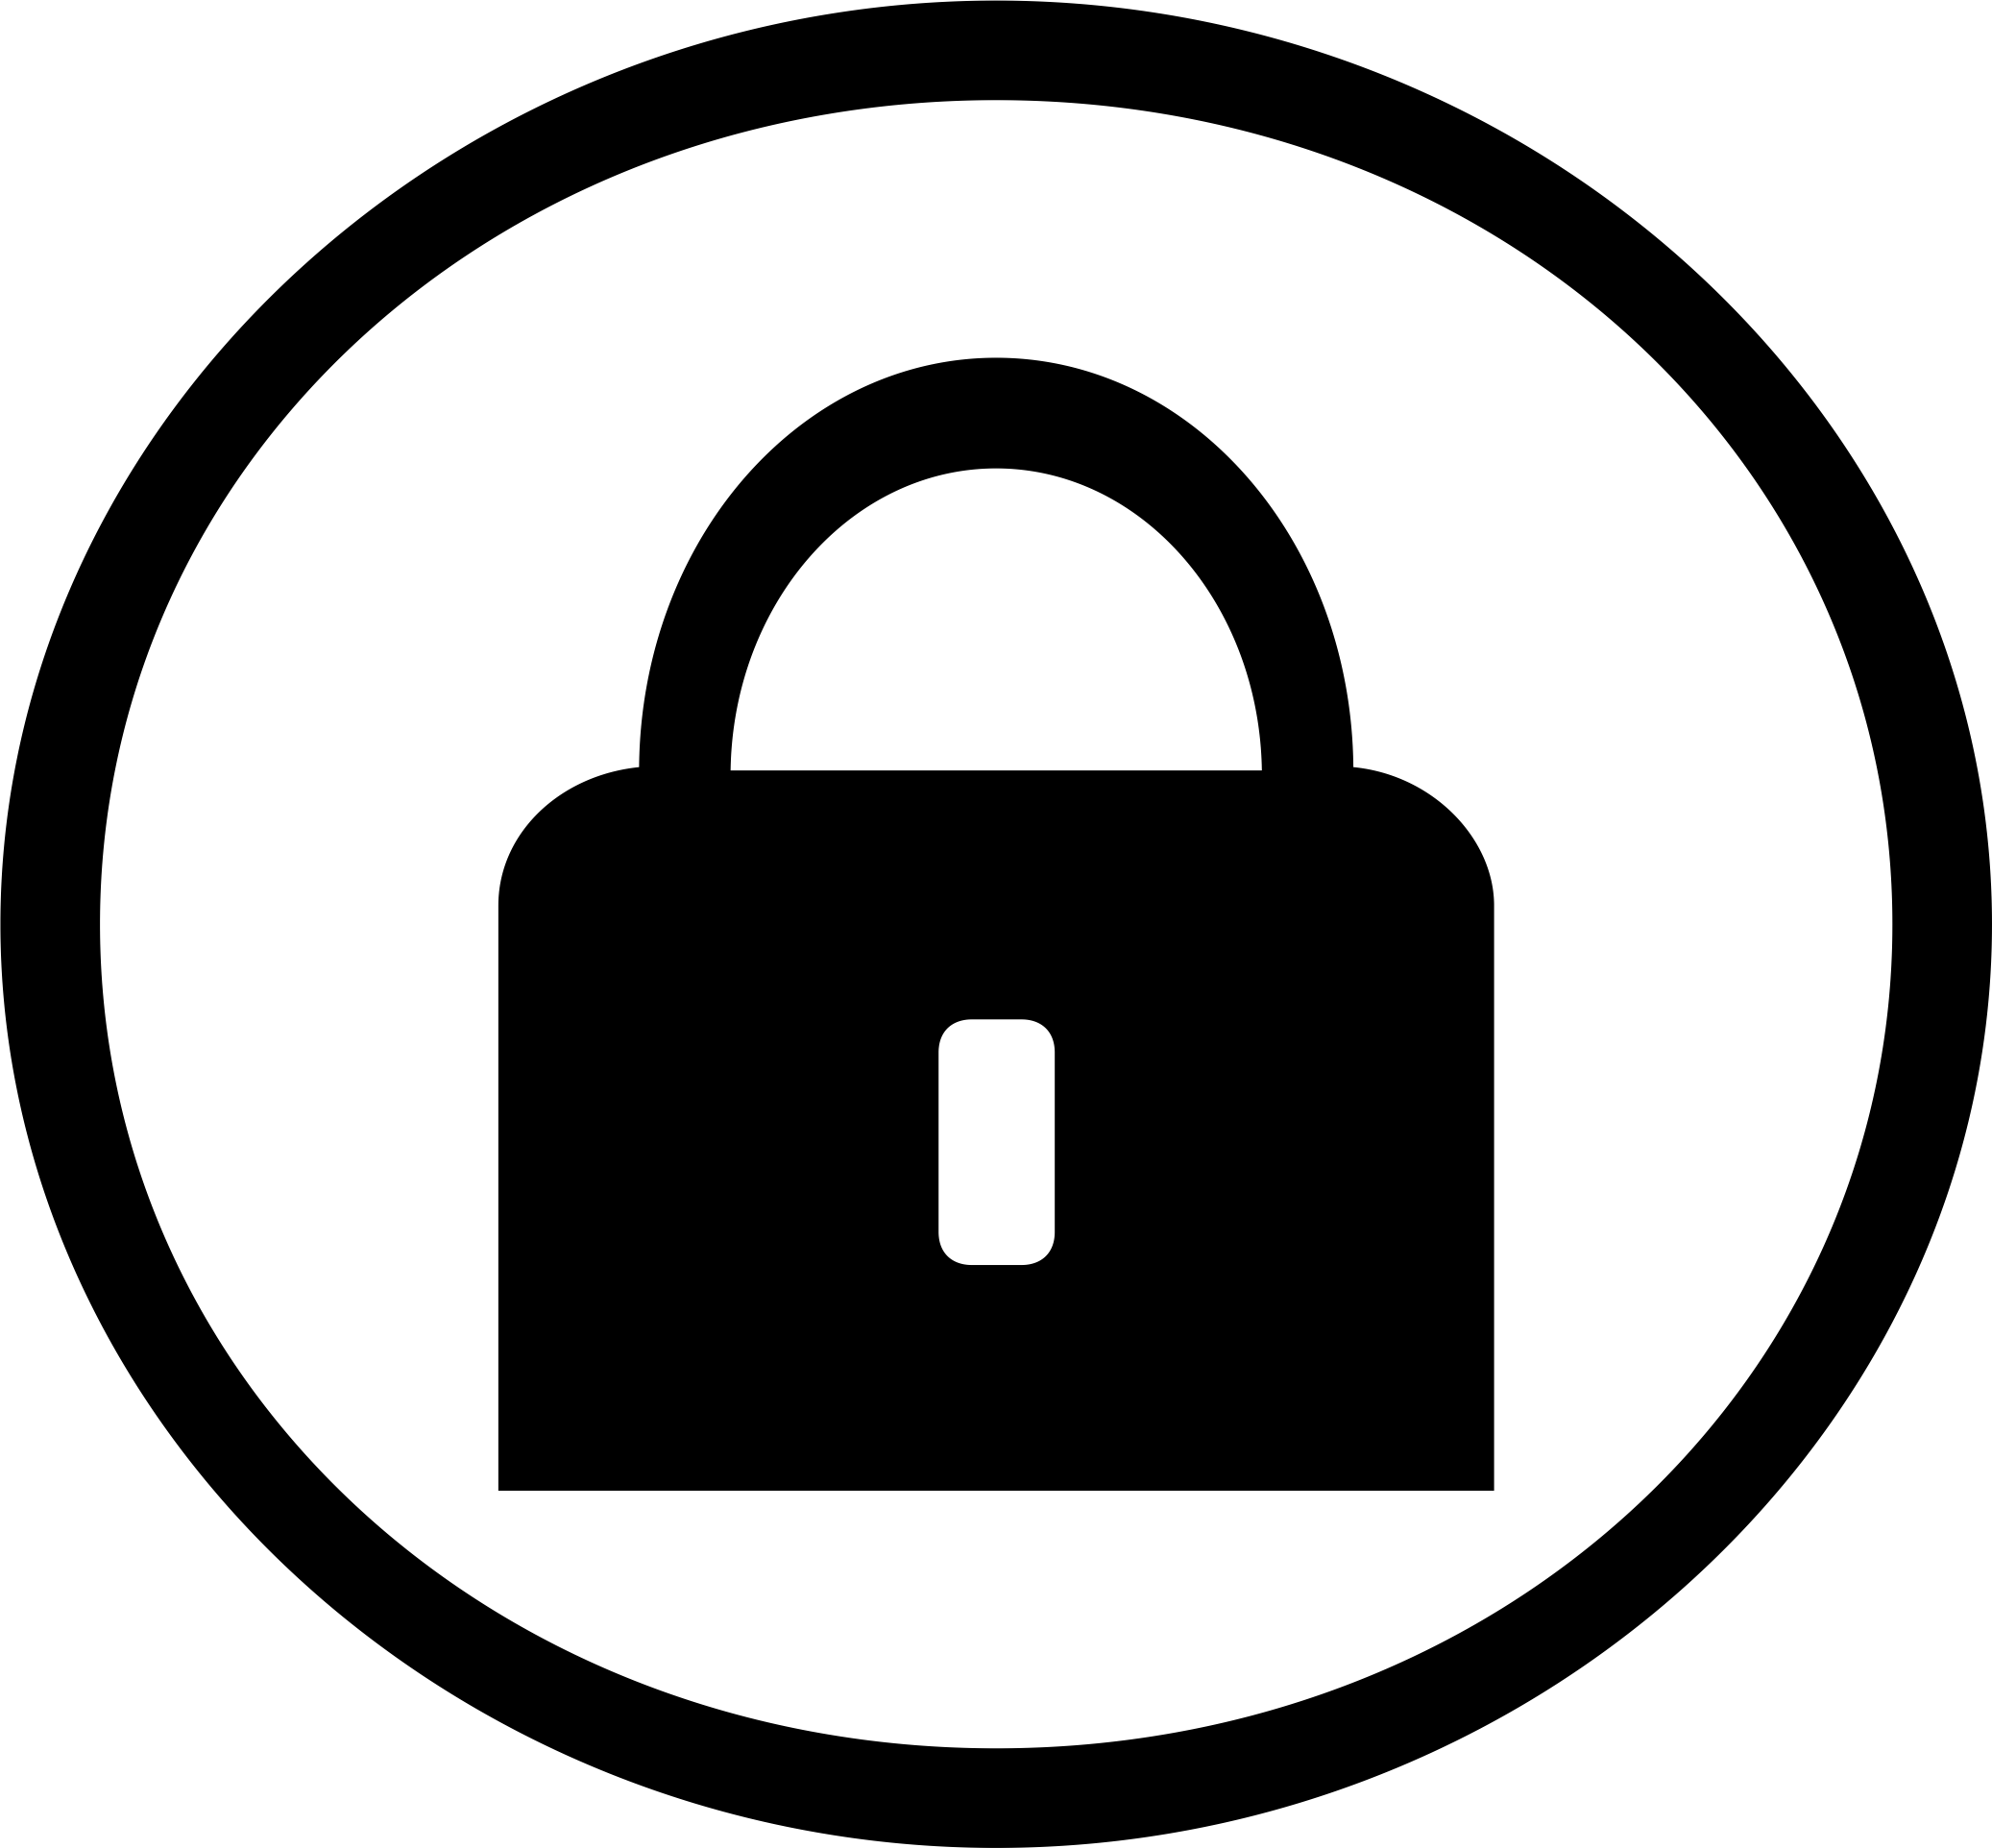 Lock clipart lock icon. Big image png